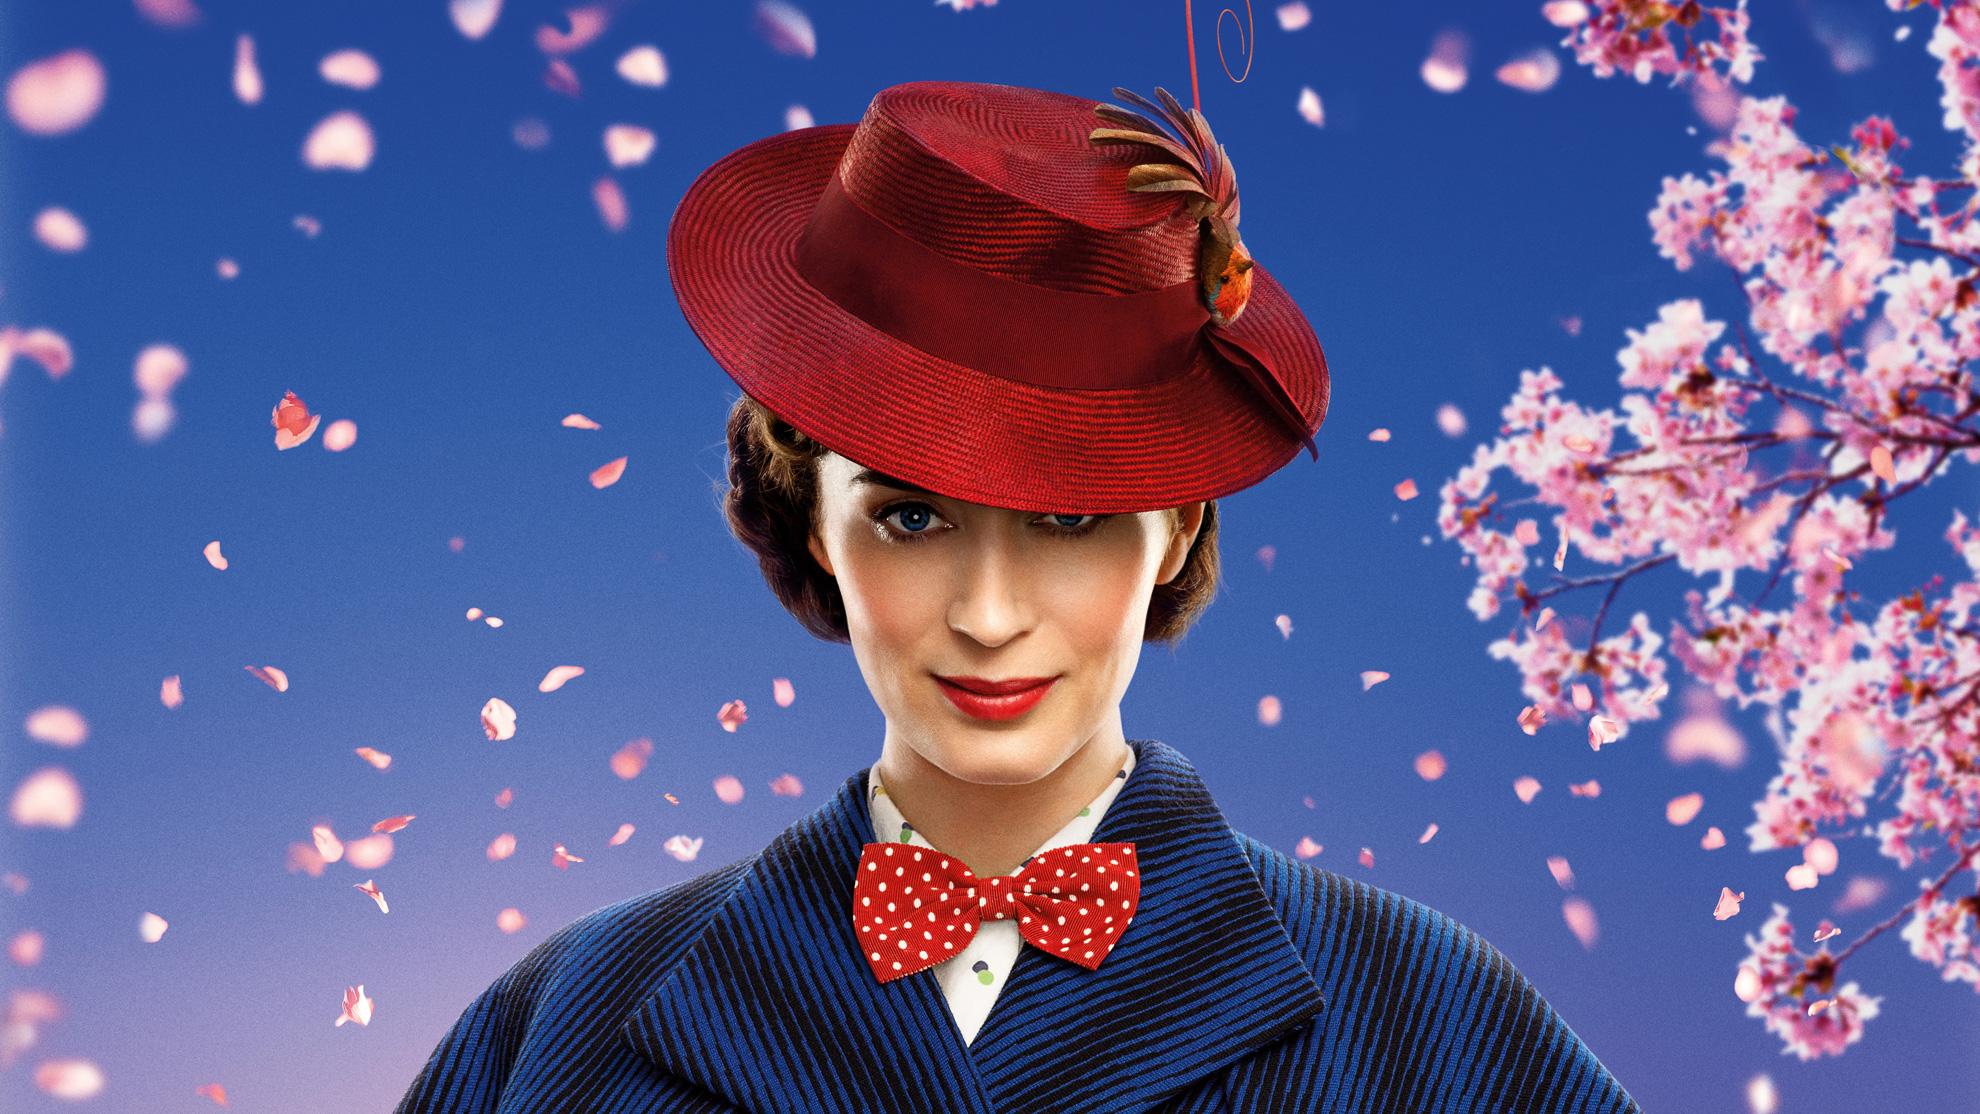 Mary Poppins Dibujos Para Colorear: Fondos Mary Poppins Returns 2018 Disney, Wallpapers